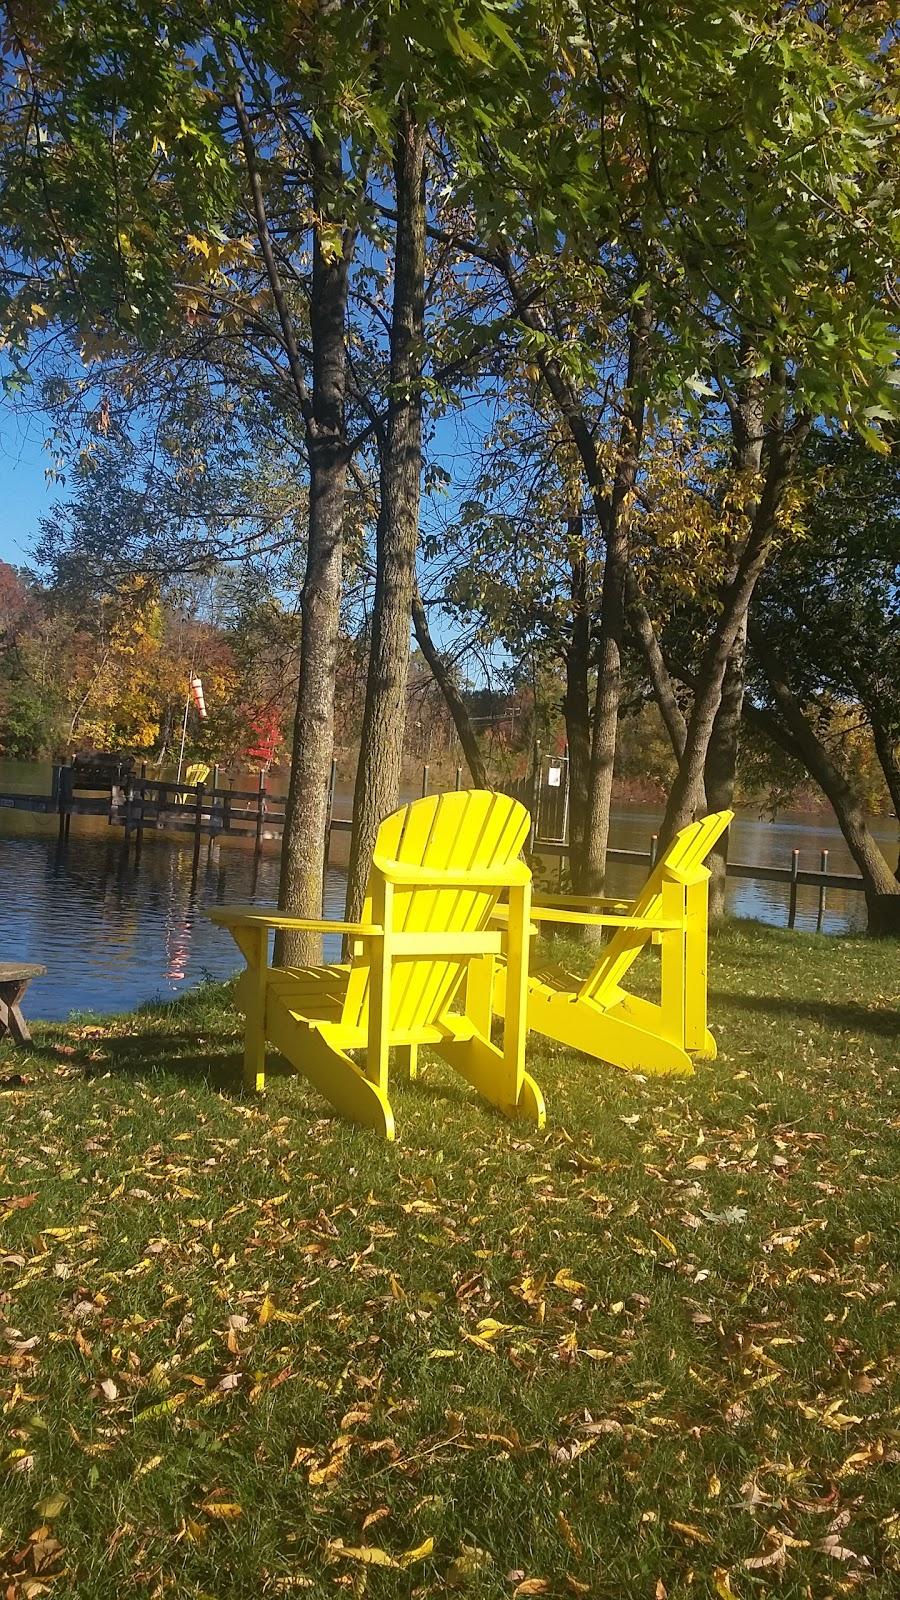 Chippawa Boat Ramp & Naisbitt Parkette - park    Photo 9 of 10   Address: 4379 Lyons Creek Rd, Niagara Falls, ON L2G, Canada, Canada   Phone: (905) 356-7521 ext. 3330